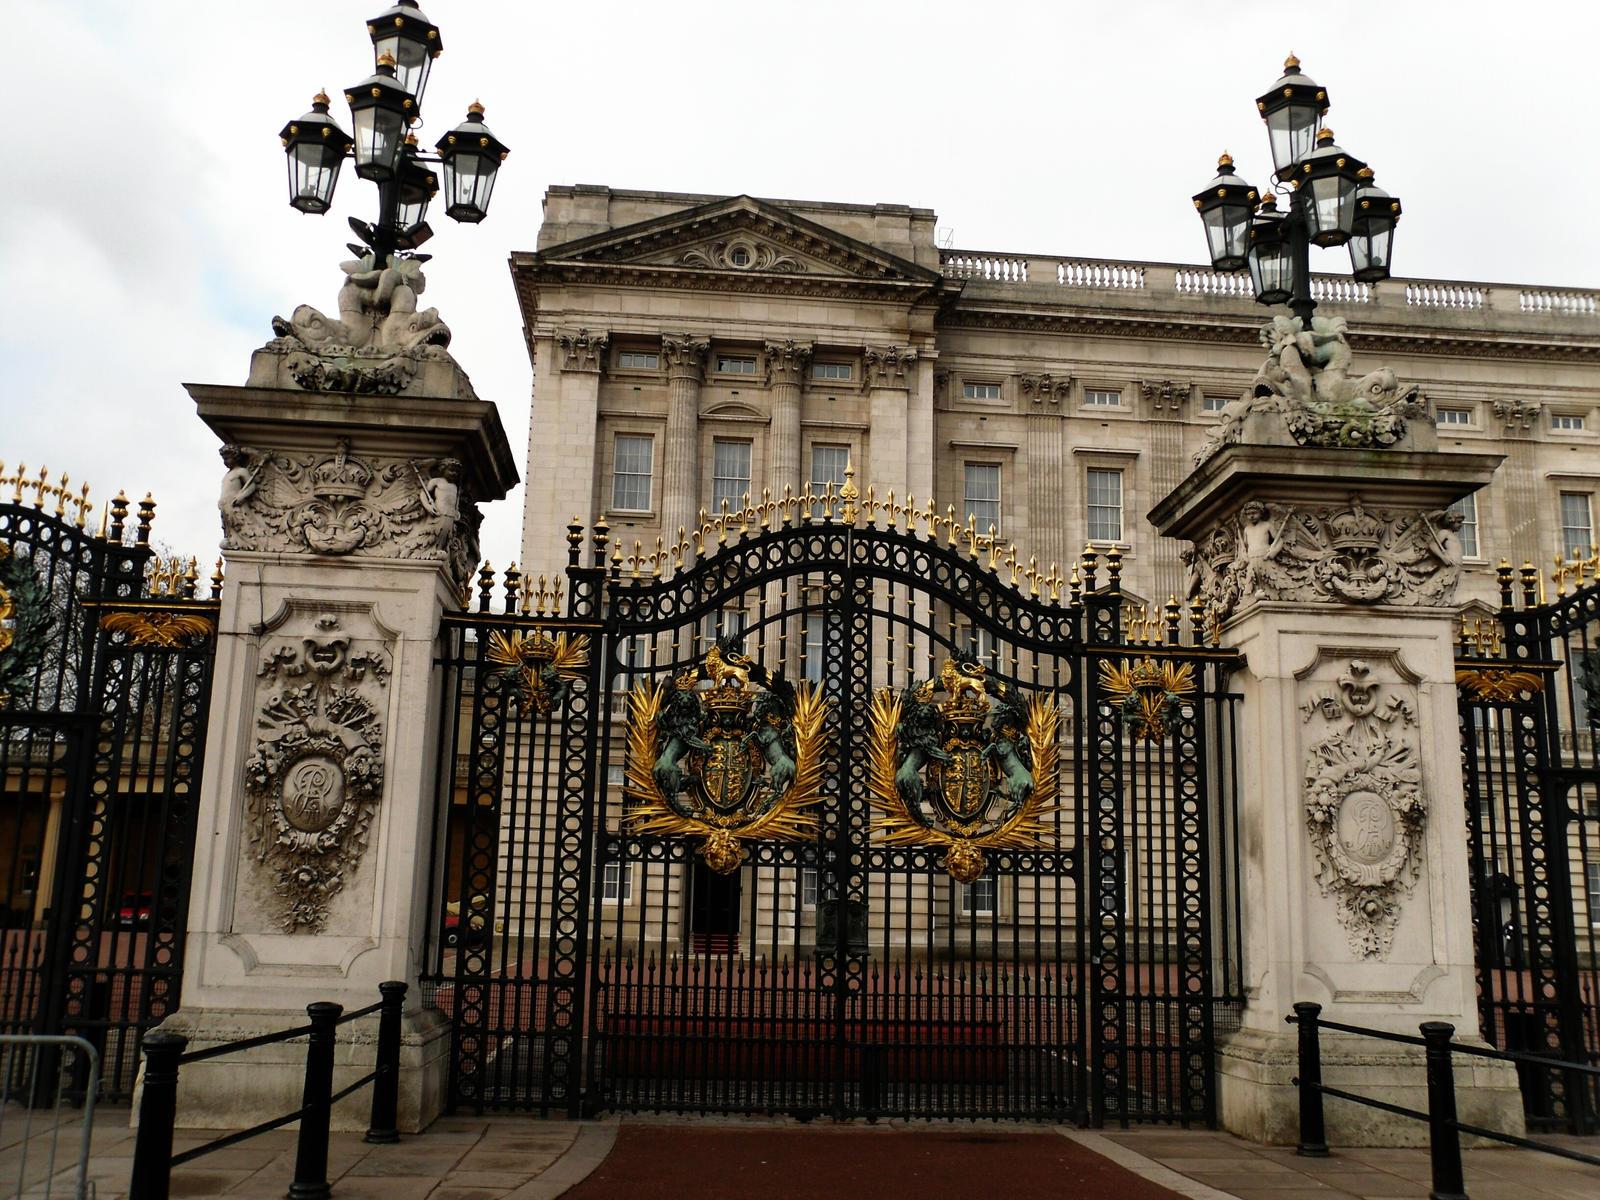 Buckingham palace gate by londonicious on deviantart